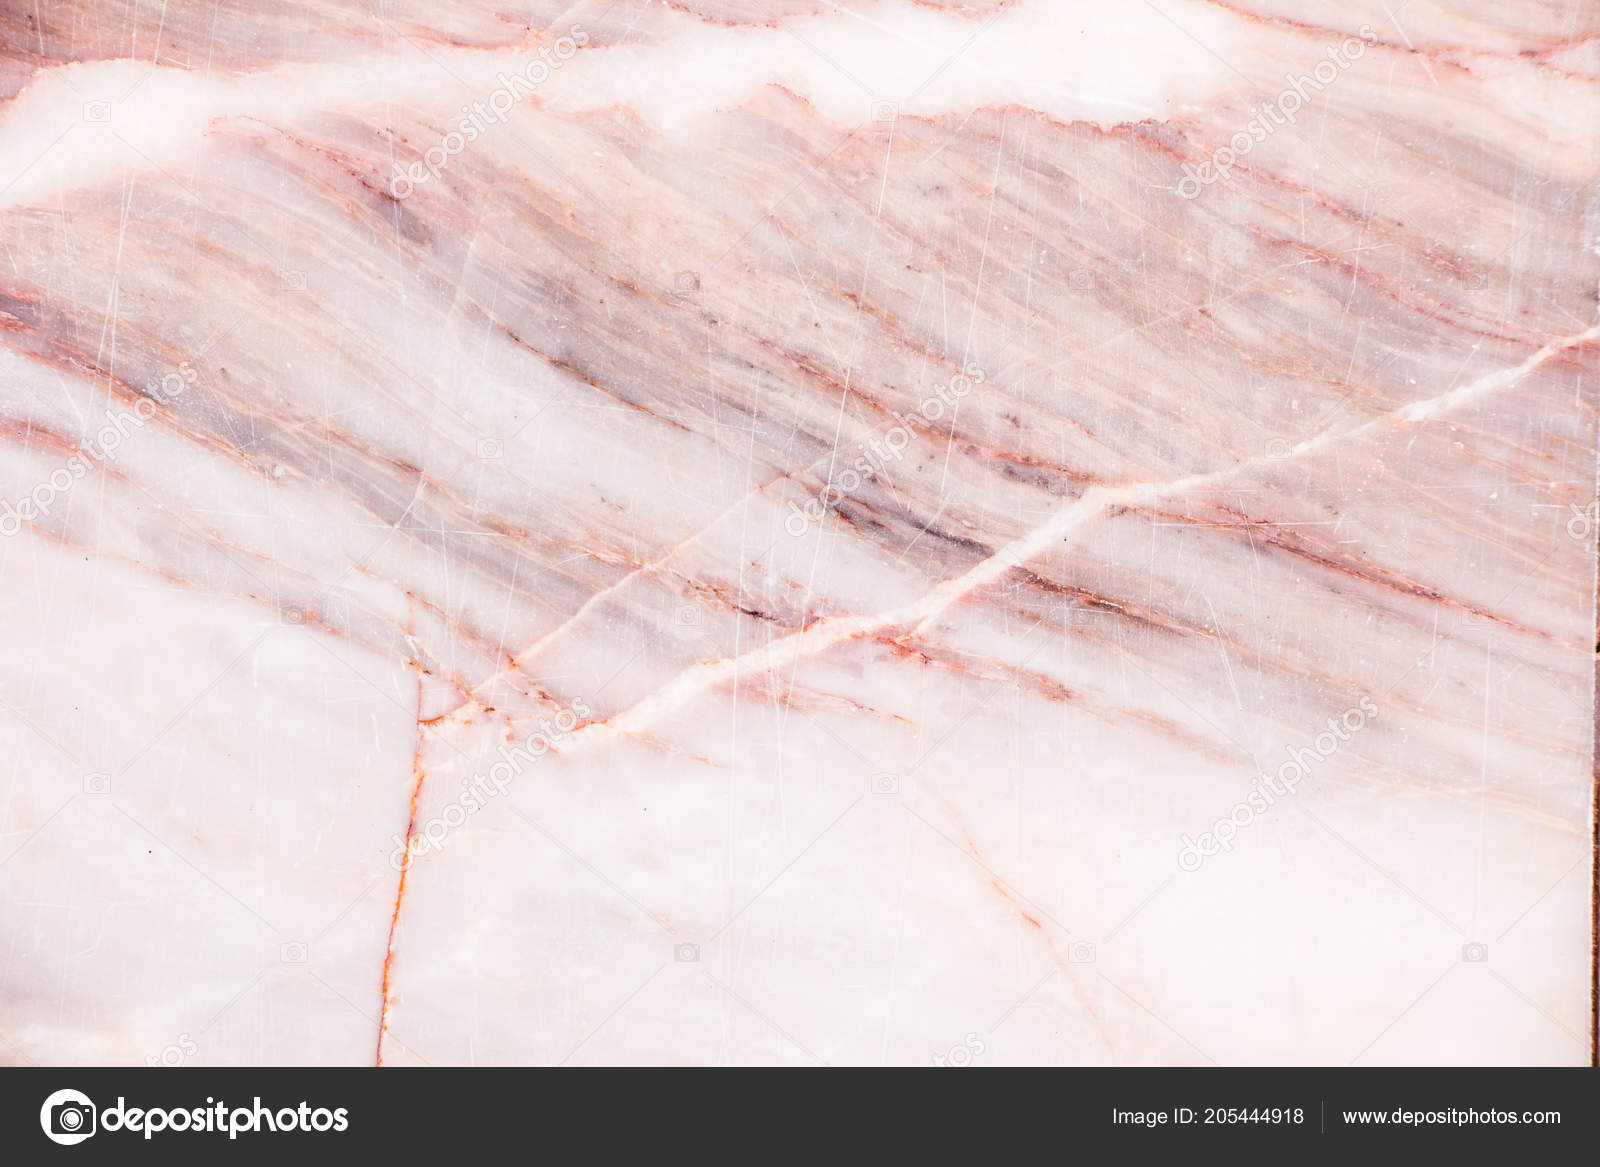 White Marble Texture Background High Resolution Stock Photo C Jukree 205444918